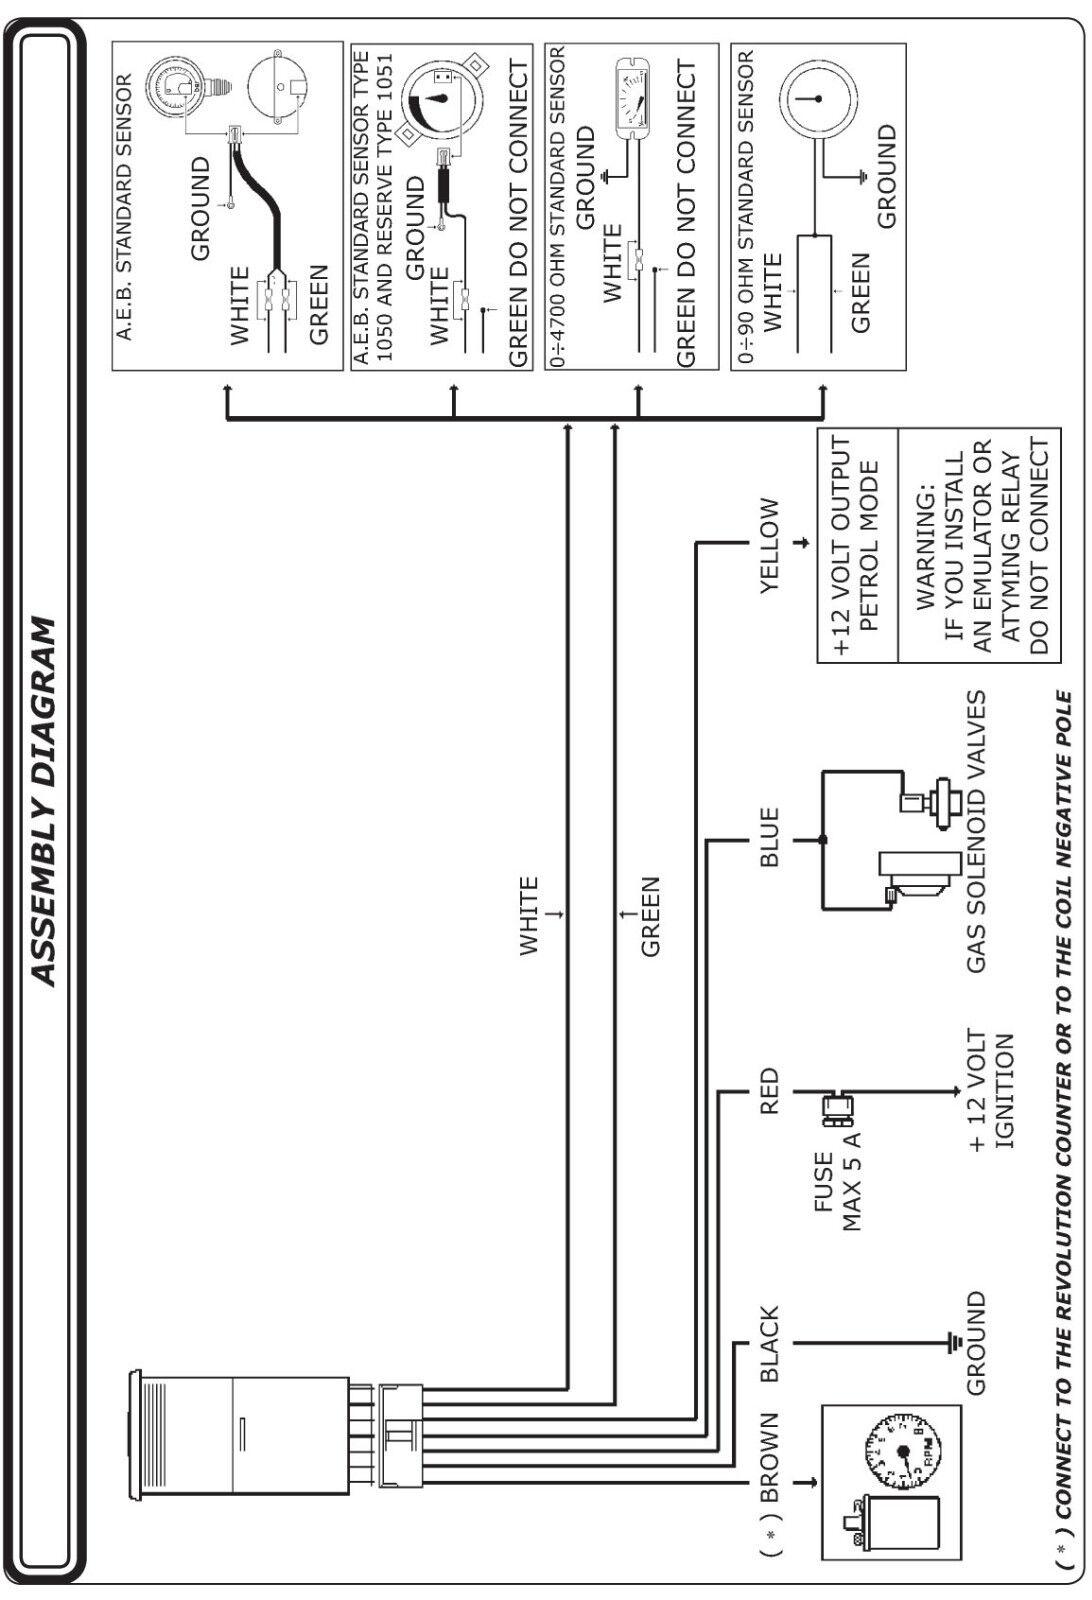 hight resolution of car lpg wiring diagram wiring library car lpg wiring diagram